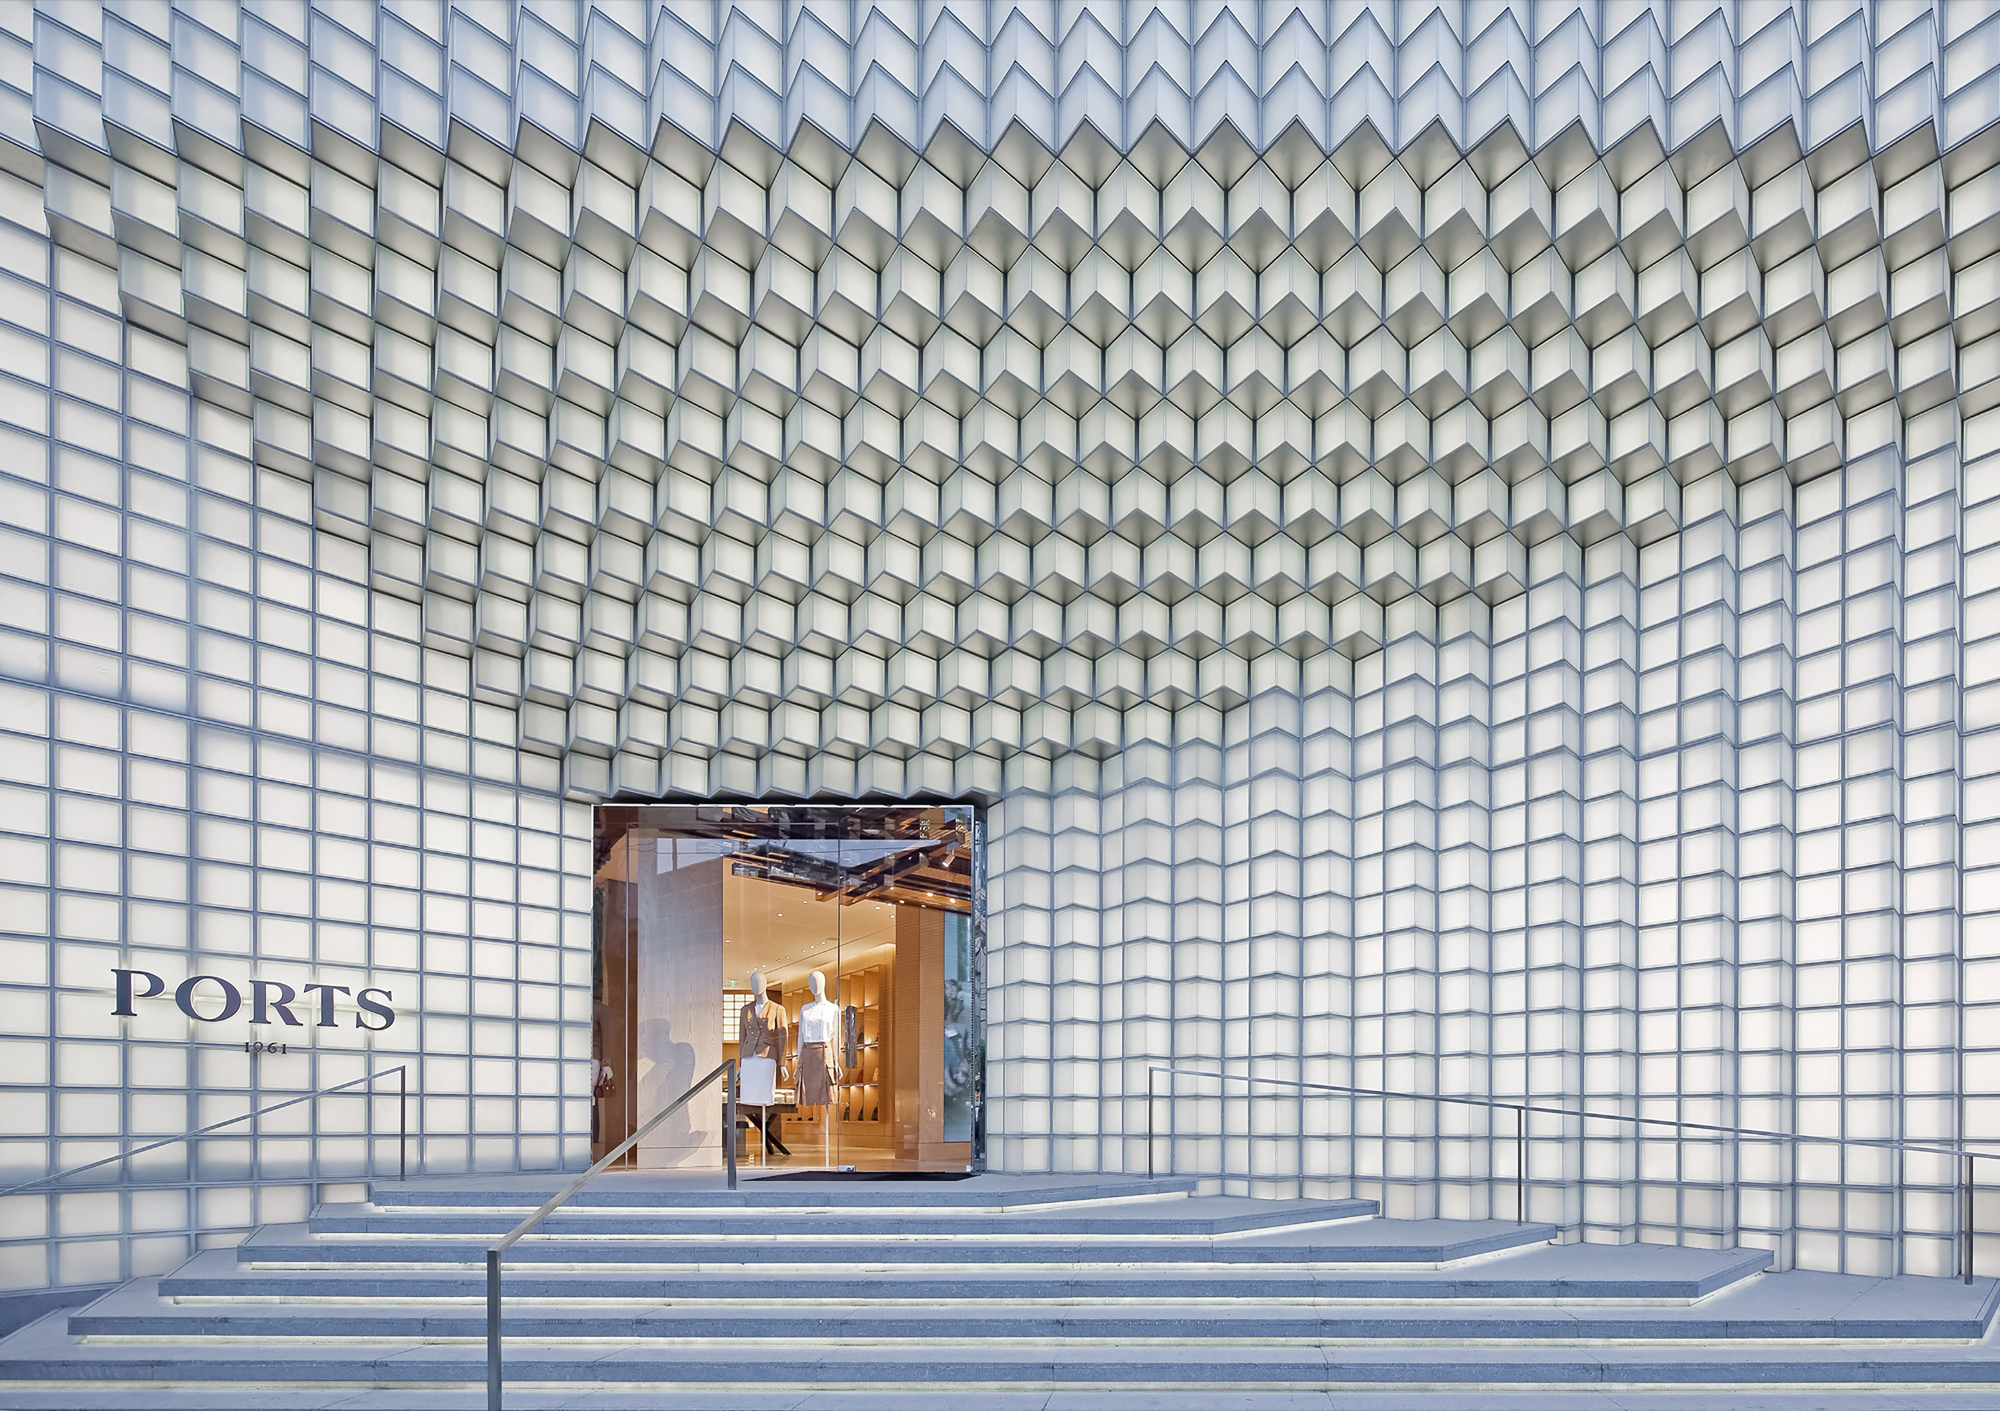 Brick Facade Architecture Residential